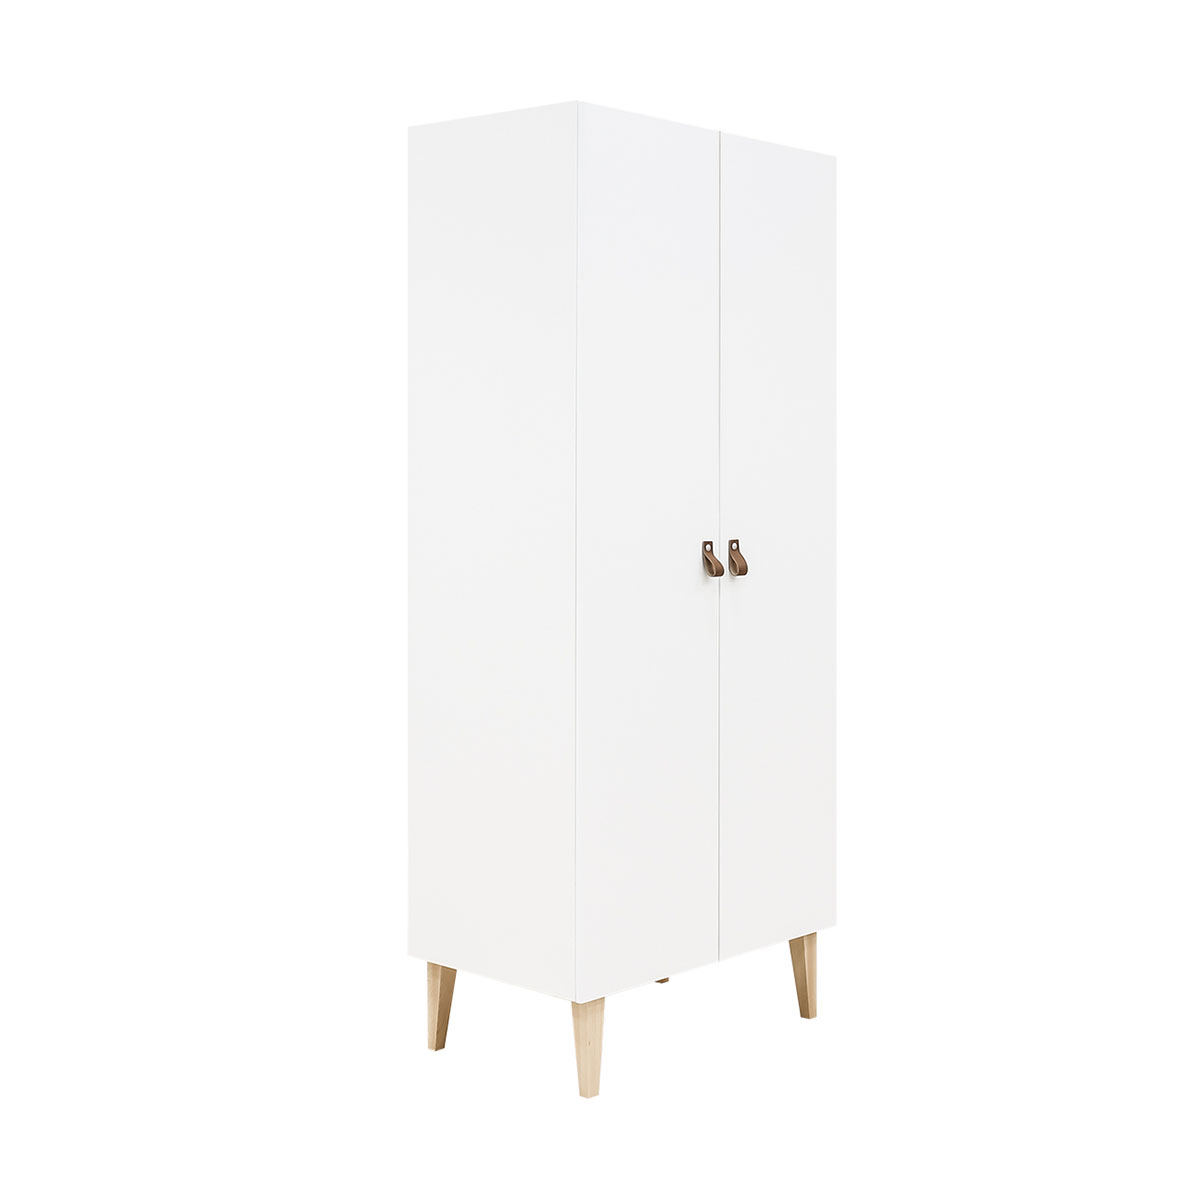 Armoire 2 portes blanc bois naturel